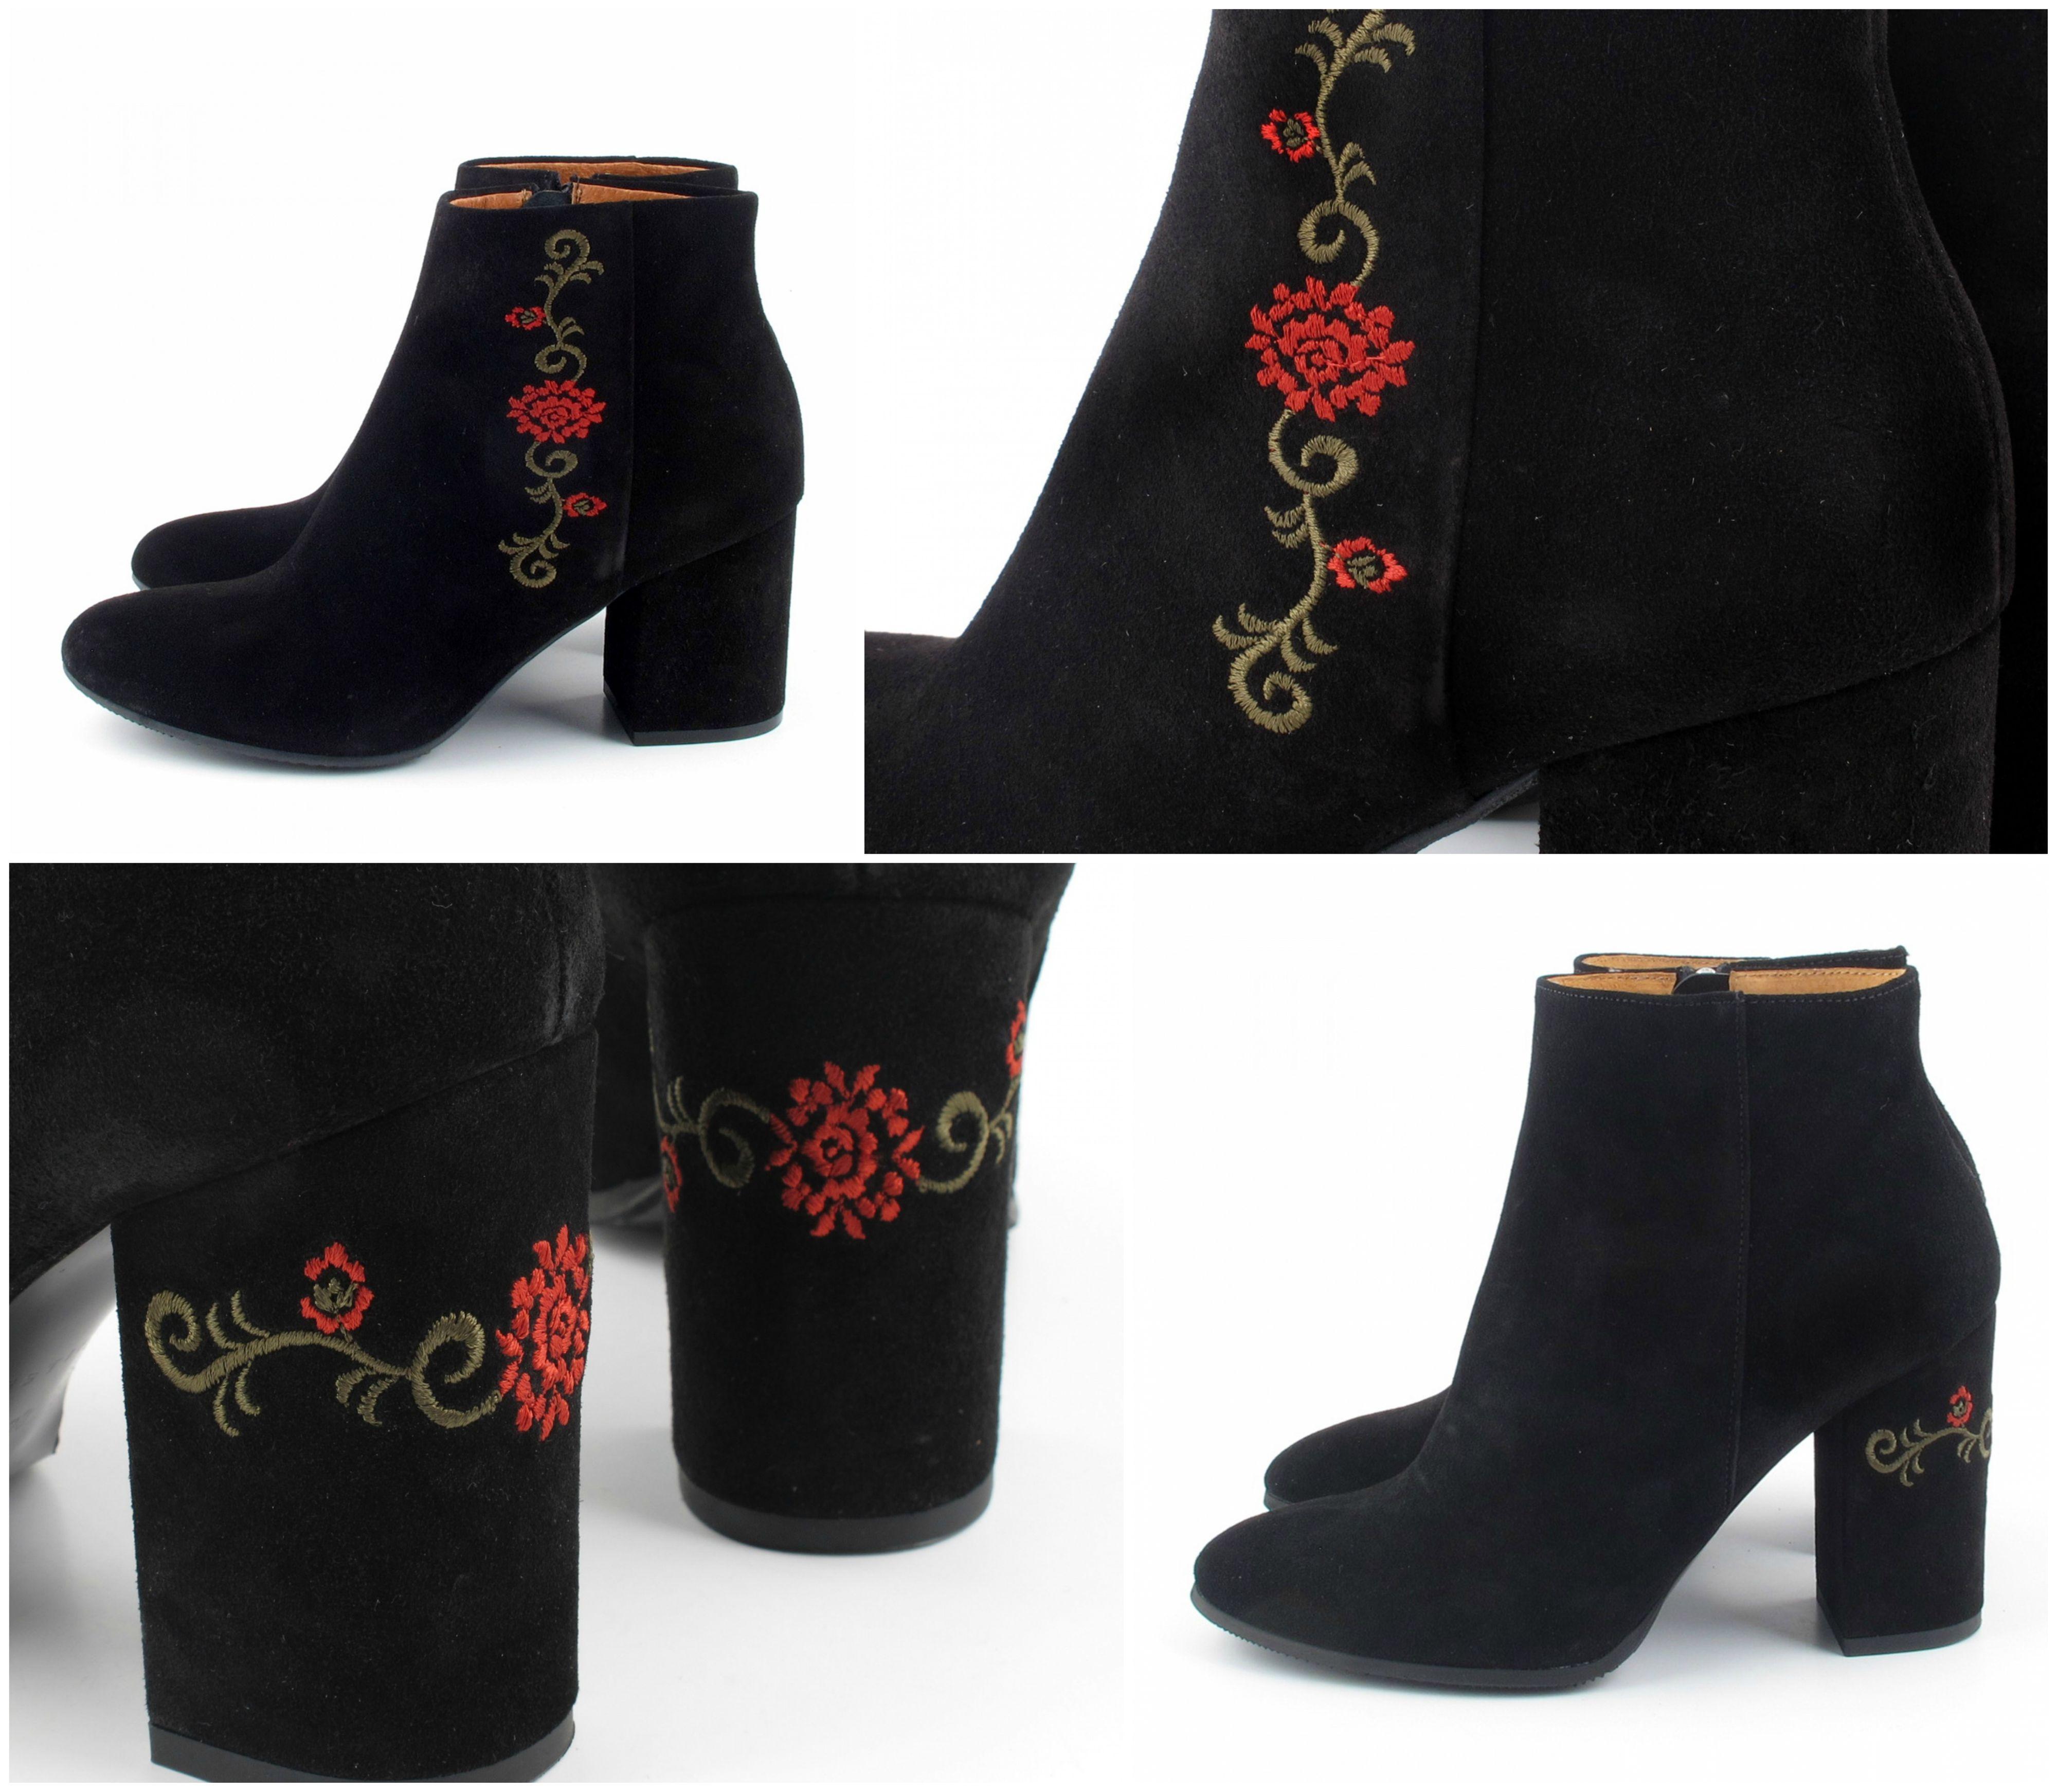 Haft Madeinpoland Botki Boots Rylko Trendy Fallwinter2017 Fall Embroidery Embroideryshoes Mixbuty Embroidery Shoes Boots Shoes